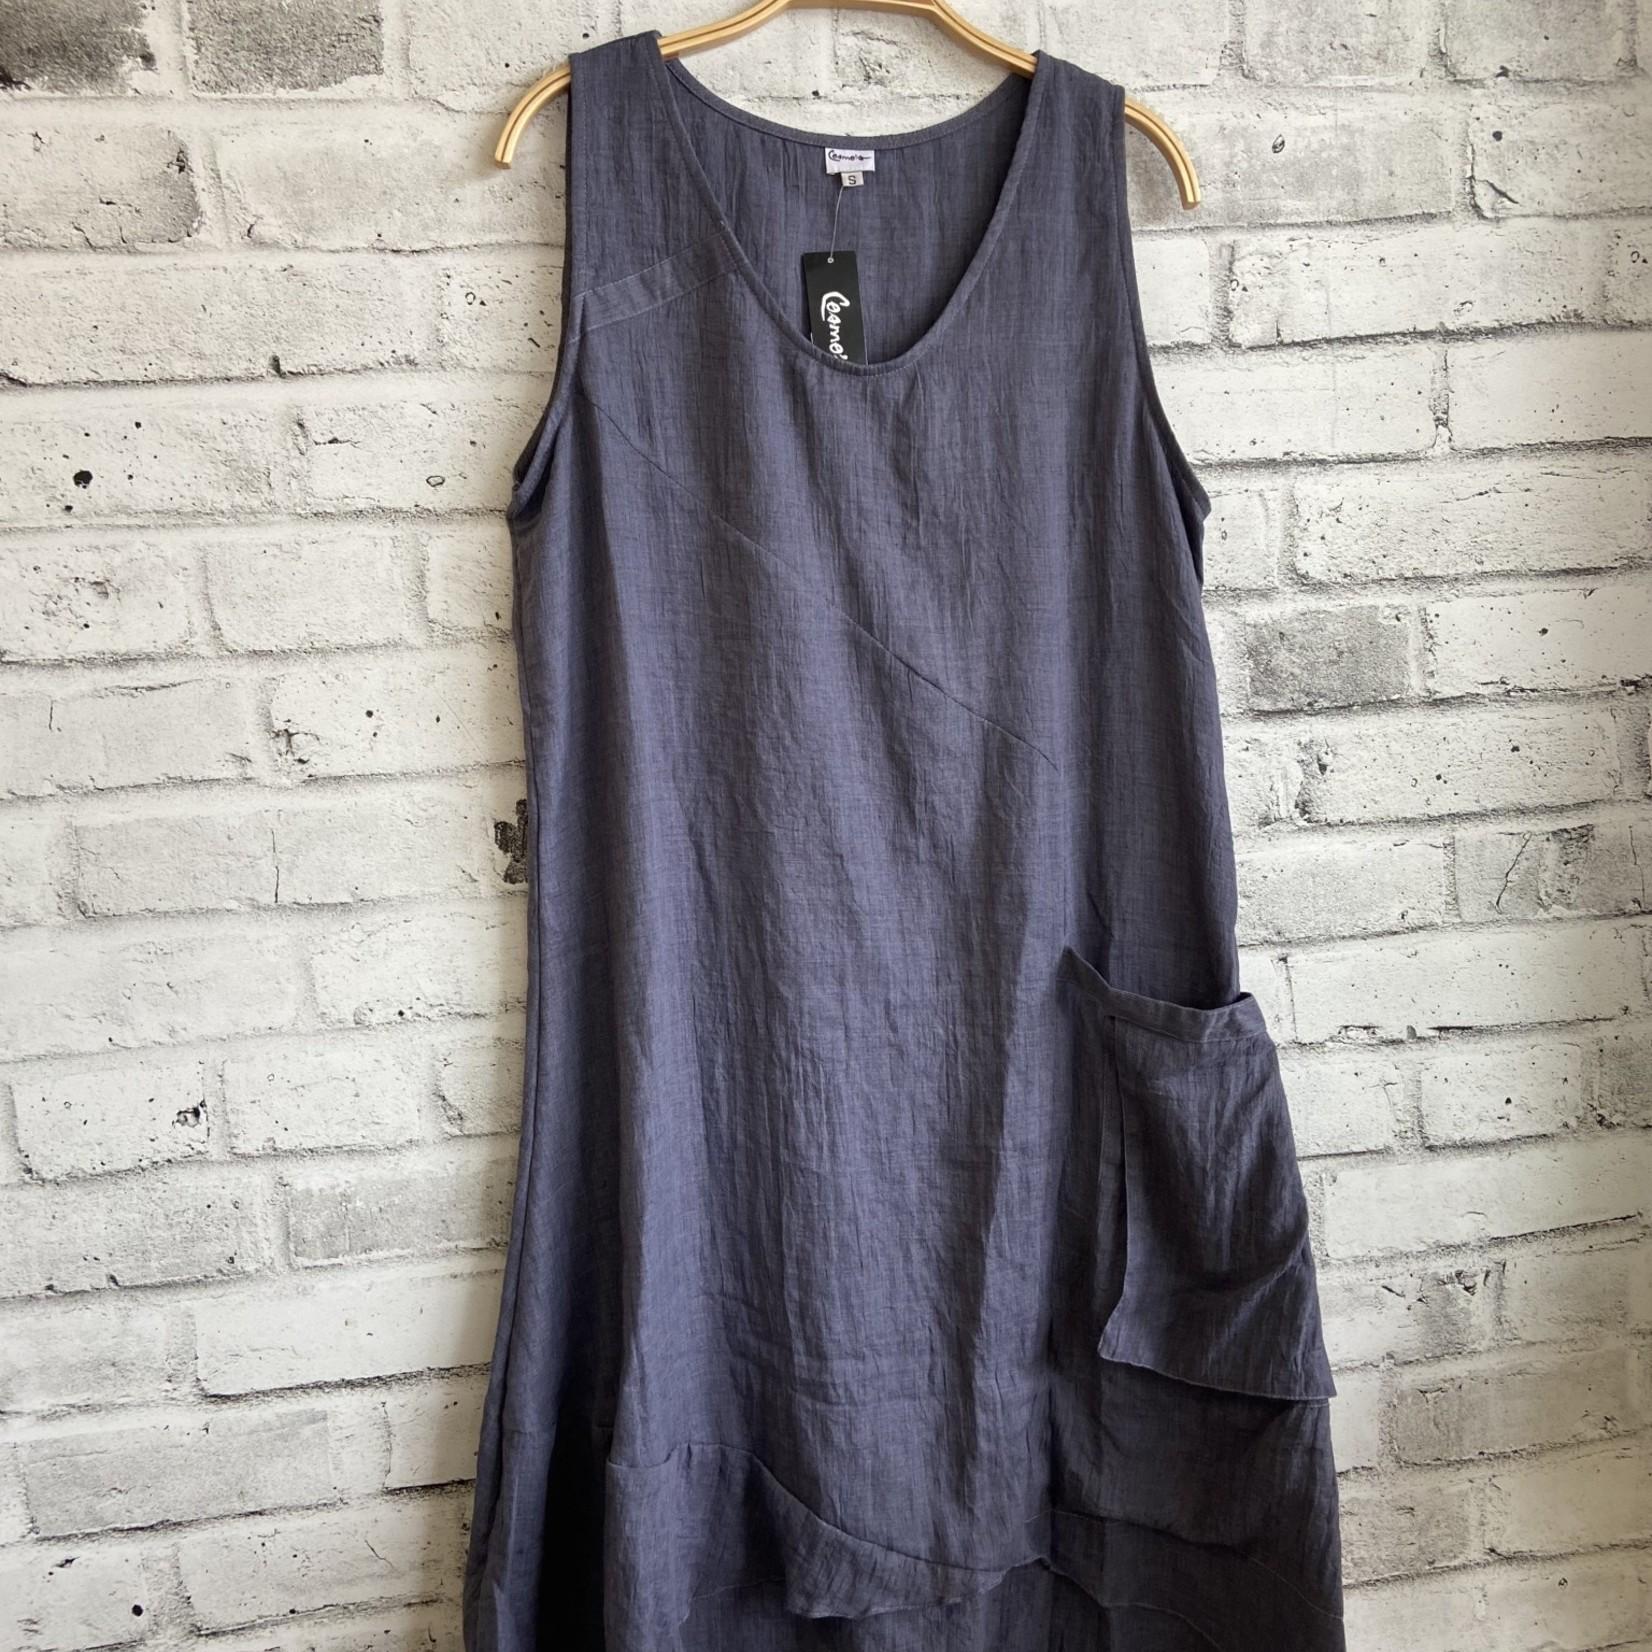 Cosmo's Impex Enterprises Dress W/ Side Pocket 805